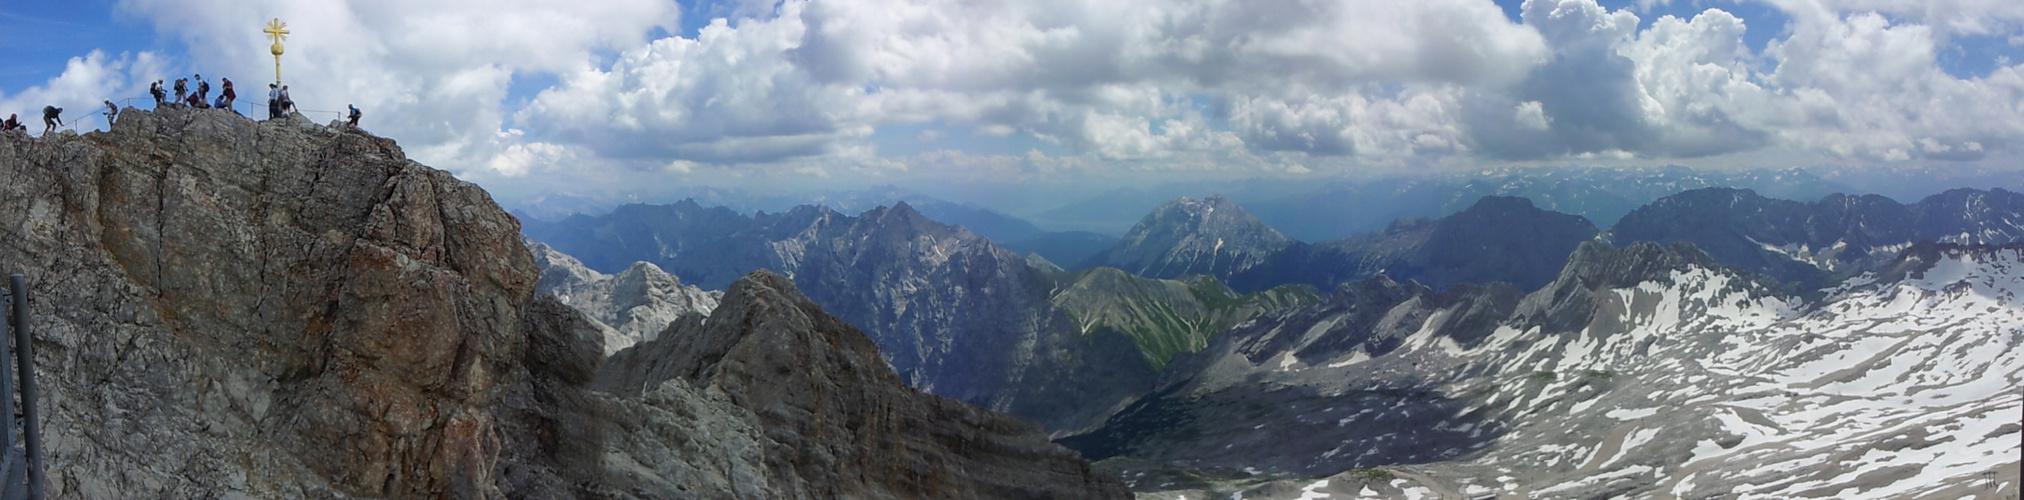 GIpfel (Zugspitze) mit Alpenpanorama1